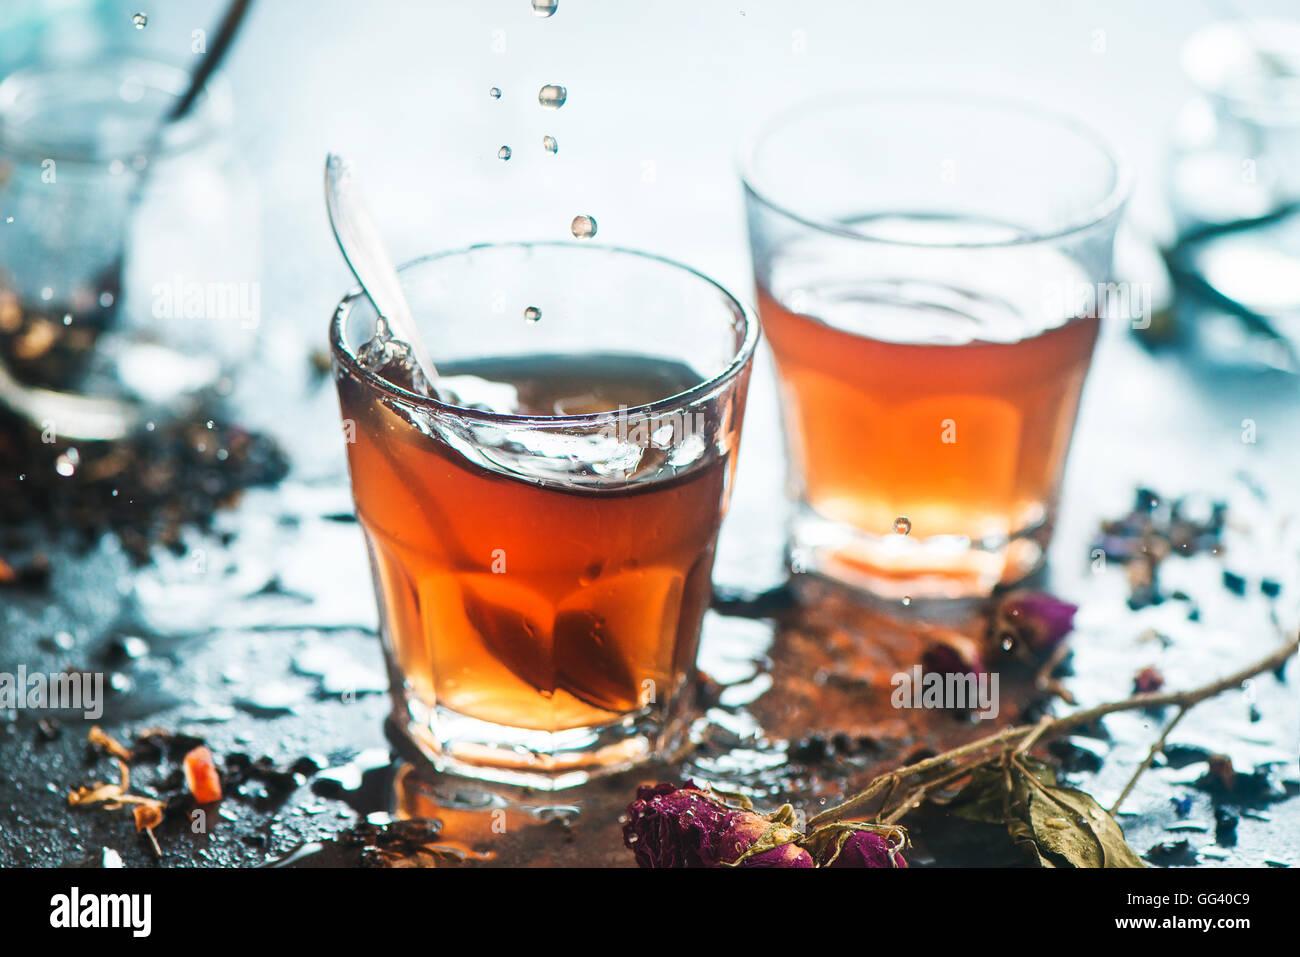 El té de la mañana con el sol Imagen De Stock